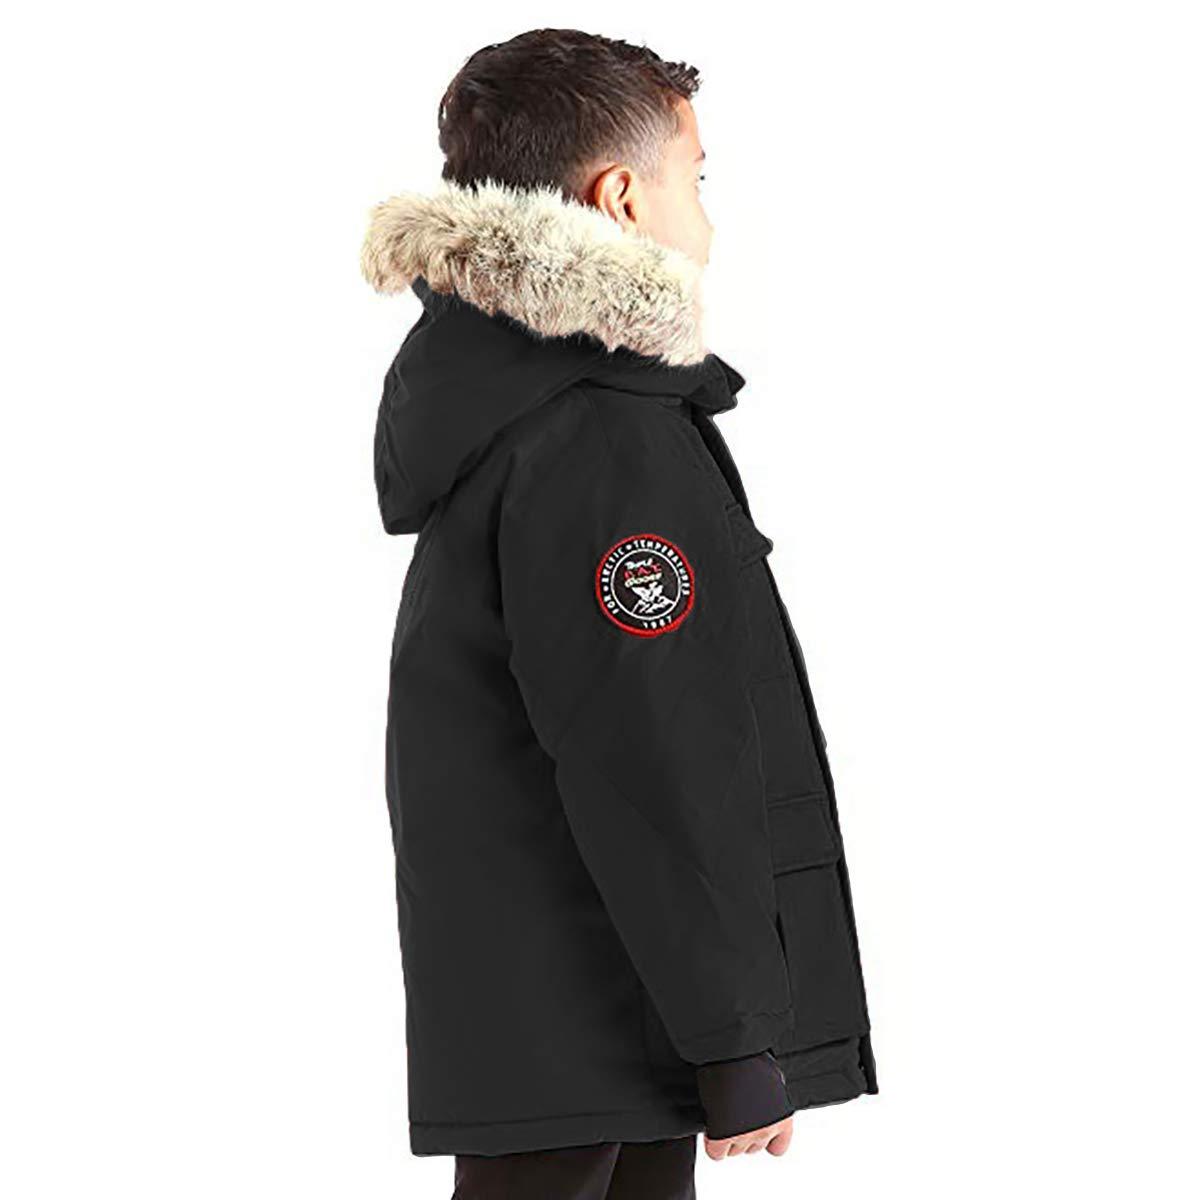 Triple F.A.T. Goose Kids Chenega Premium Down Jacket (7, Black) by Triple F.A.T. Goose (Image #2)